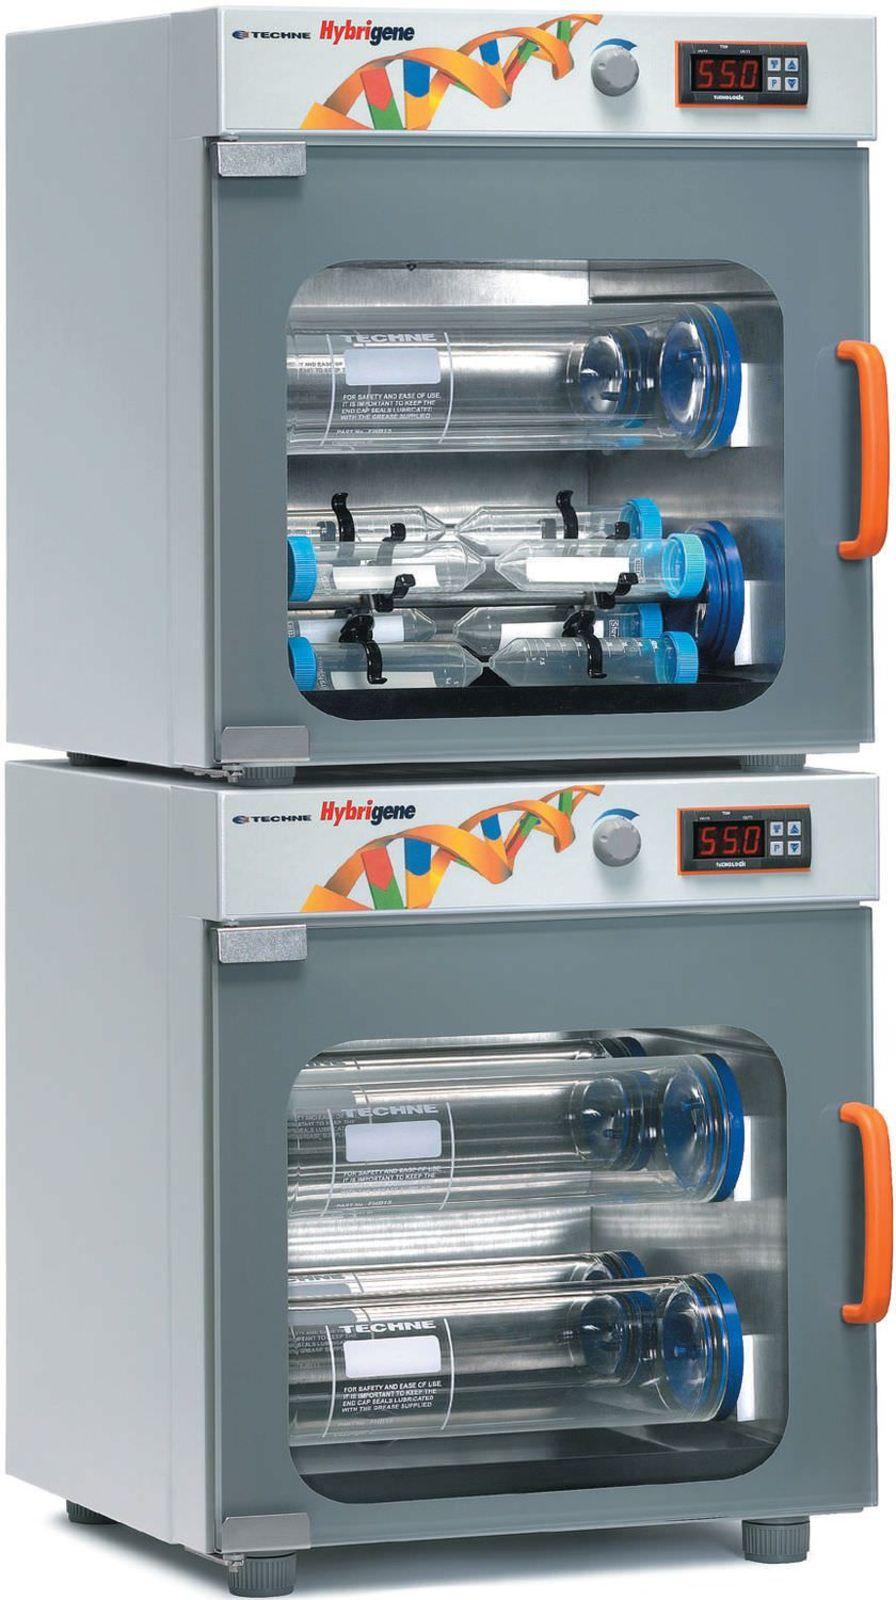 Hybridization laboratory drying oven 80 °C   HB-3D Techne